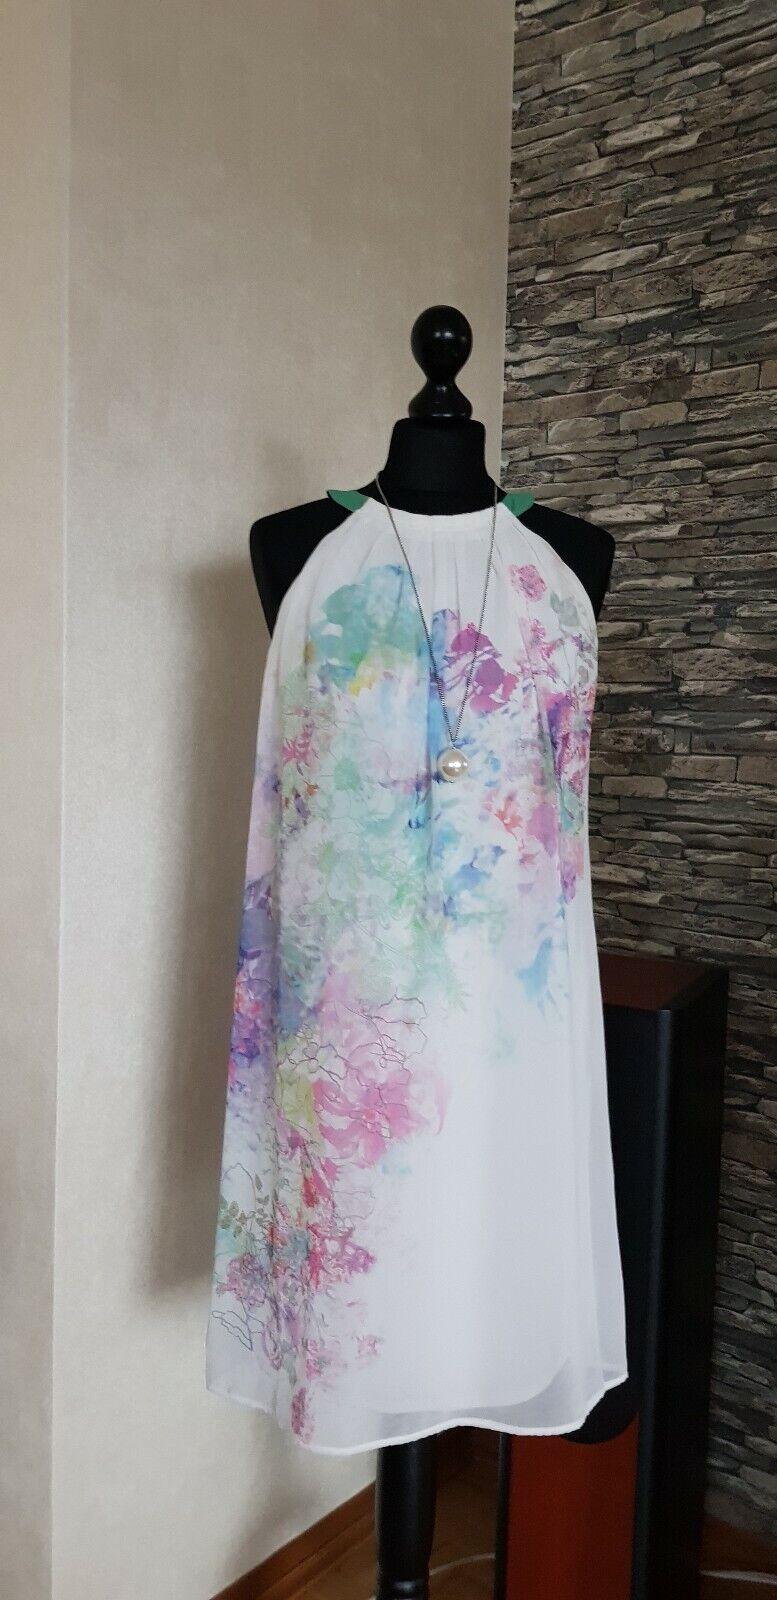 4e18fe8e607a20 Sommerkleid Strandkleid Luftig Leicht Gr.36 Abend Party Pastell Coctail  npycli886-neue Kleidung